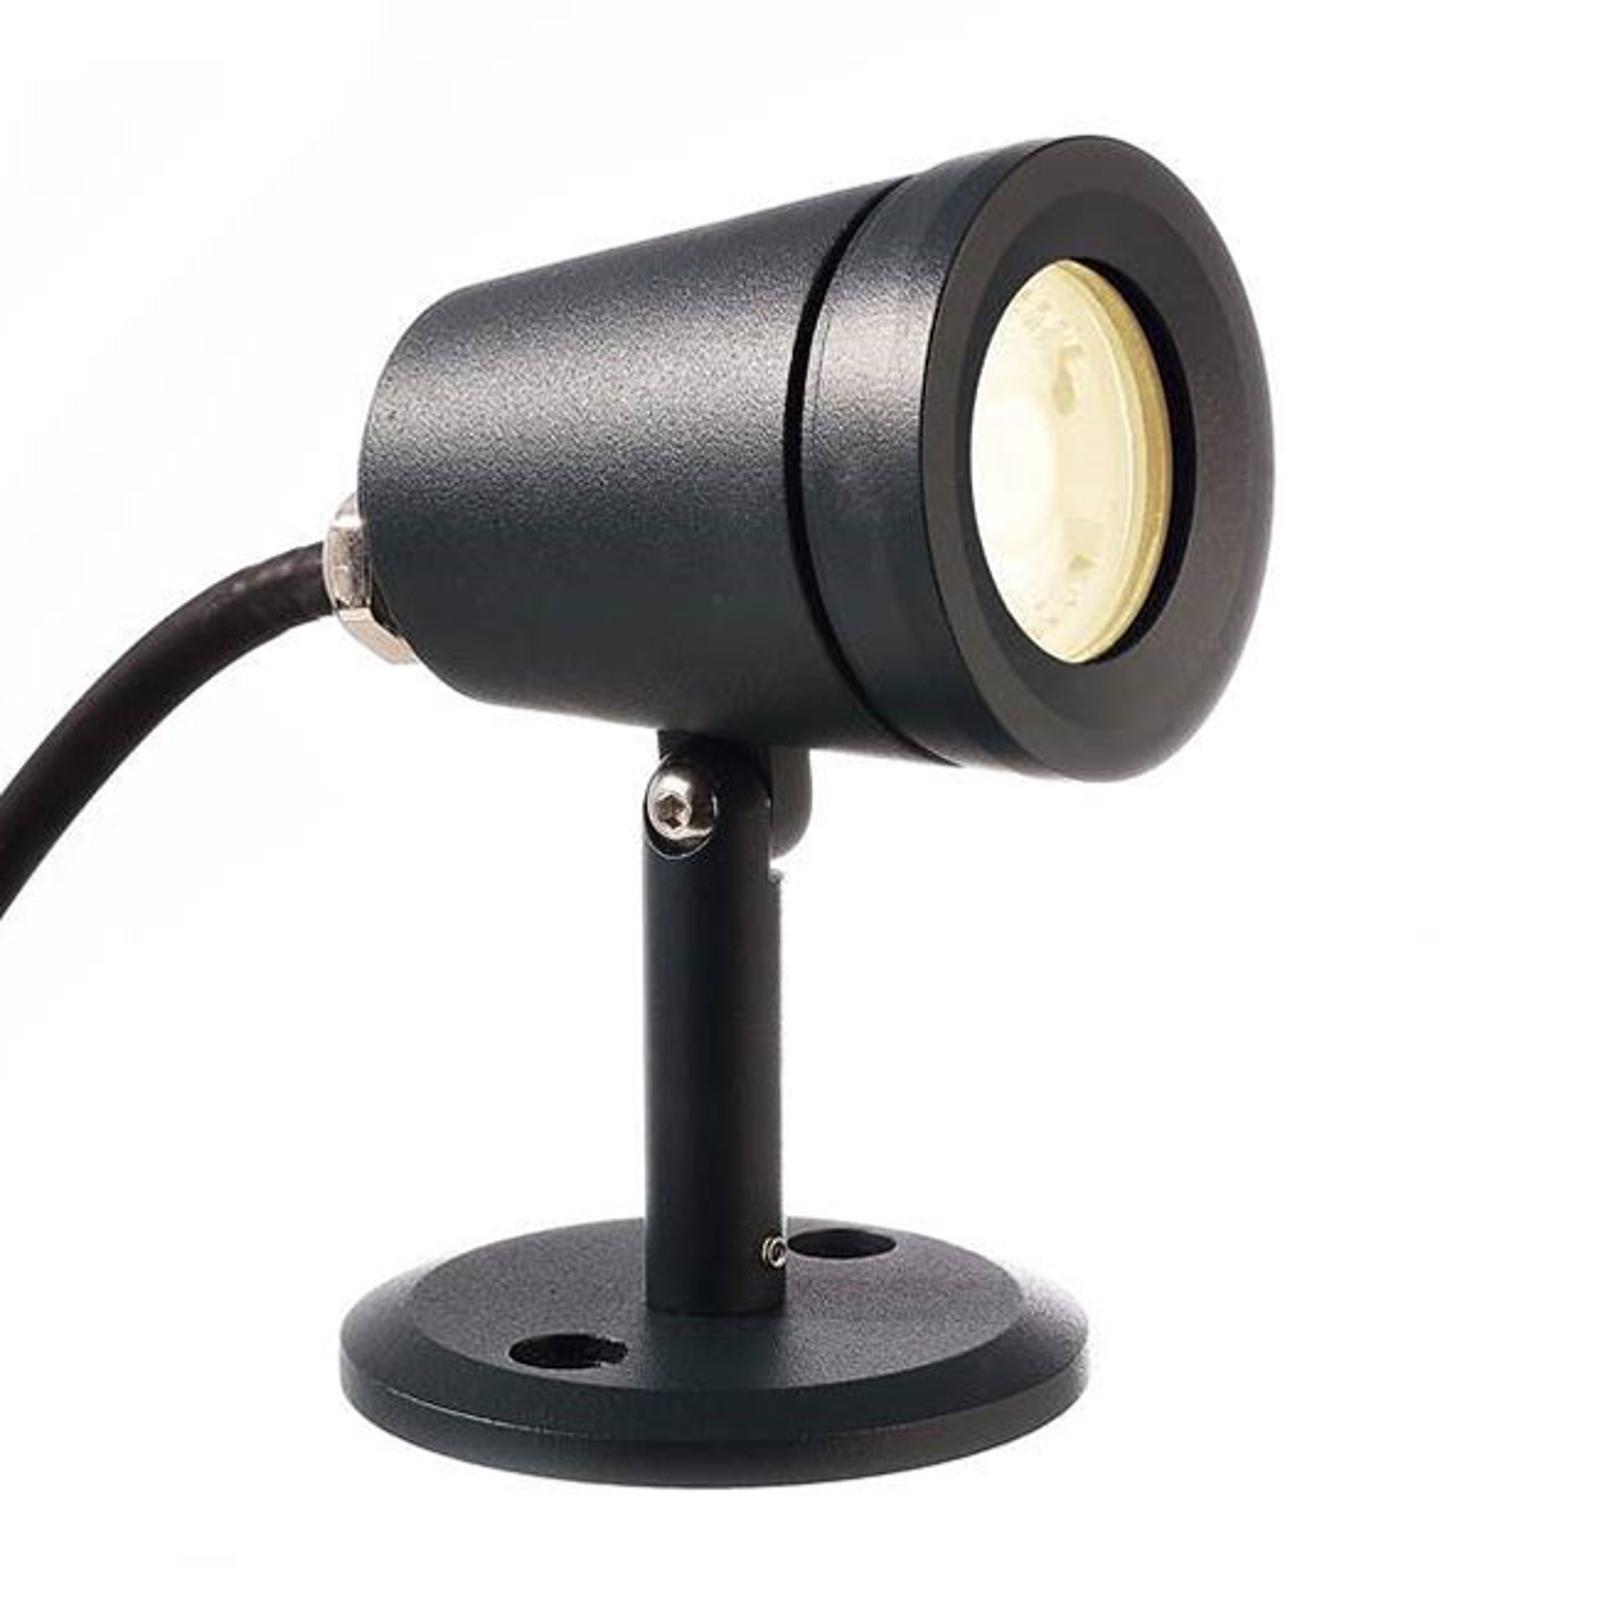 LED-buitenspot Colt, warmwit, draaibaar, 4 W